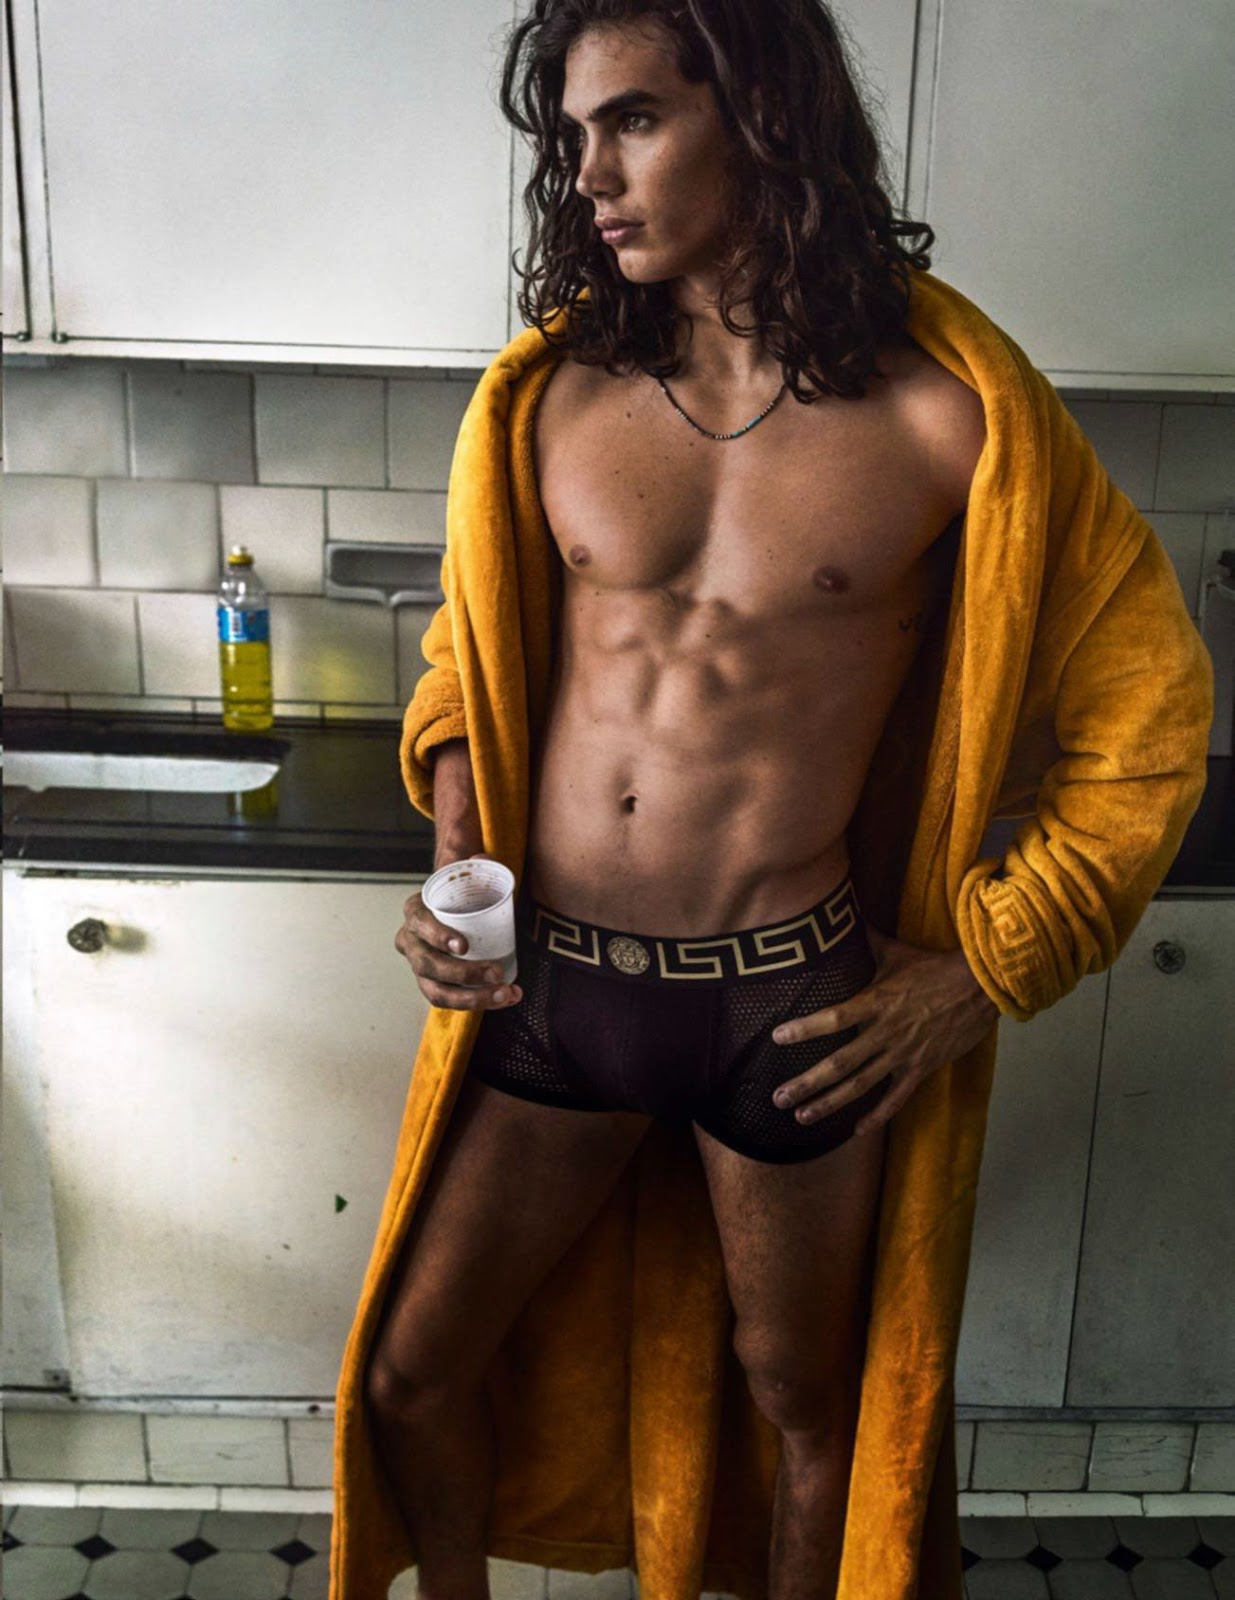 image Naked gay twinks bodybuilder bryan licks